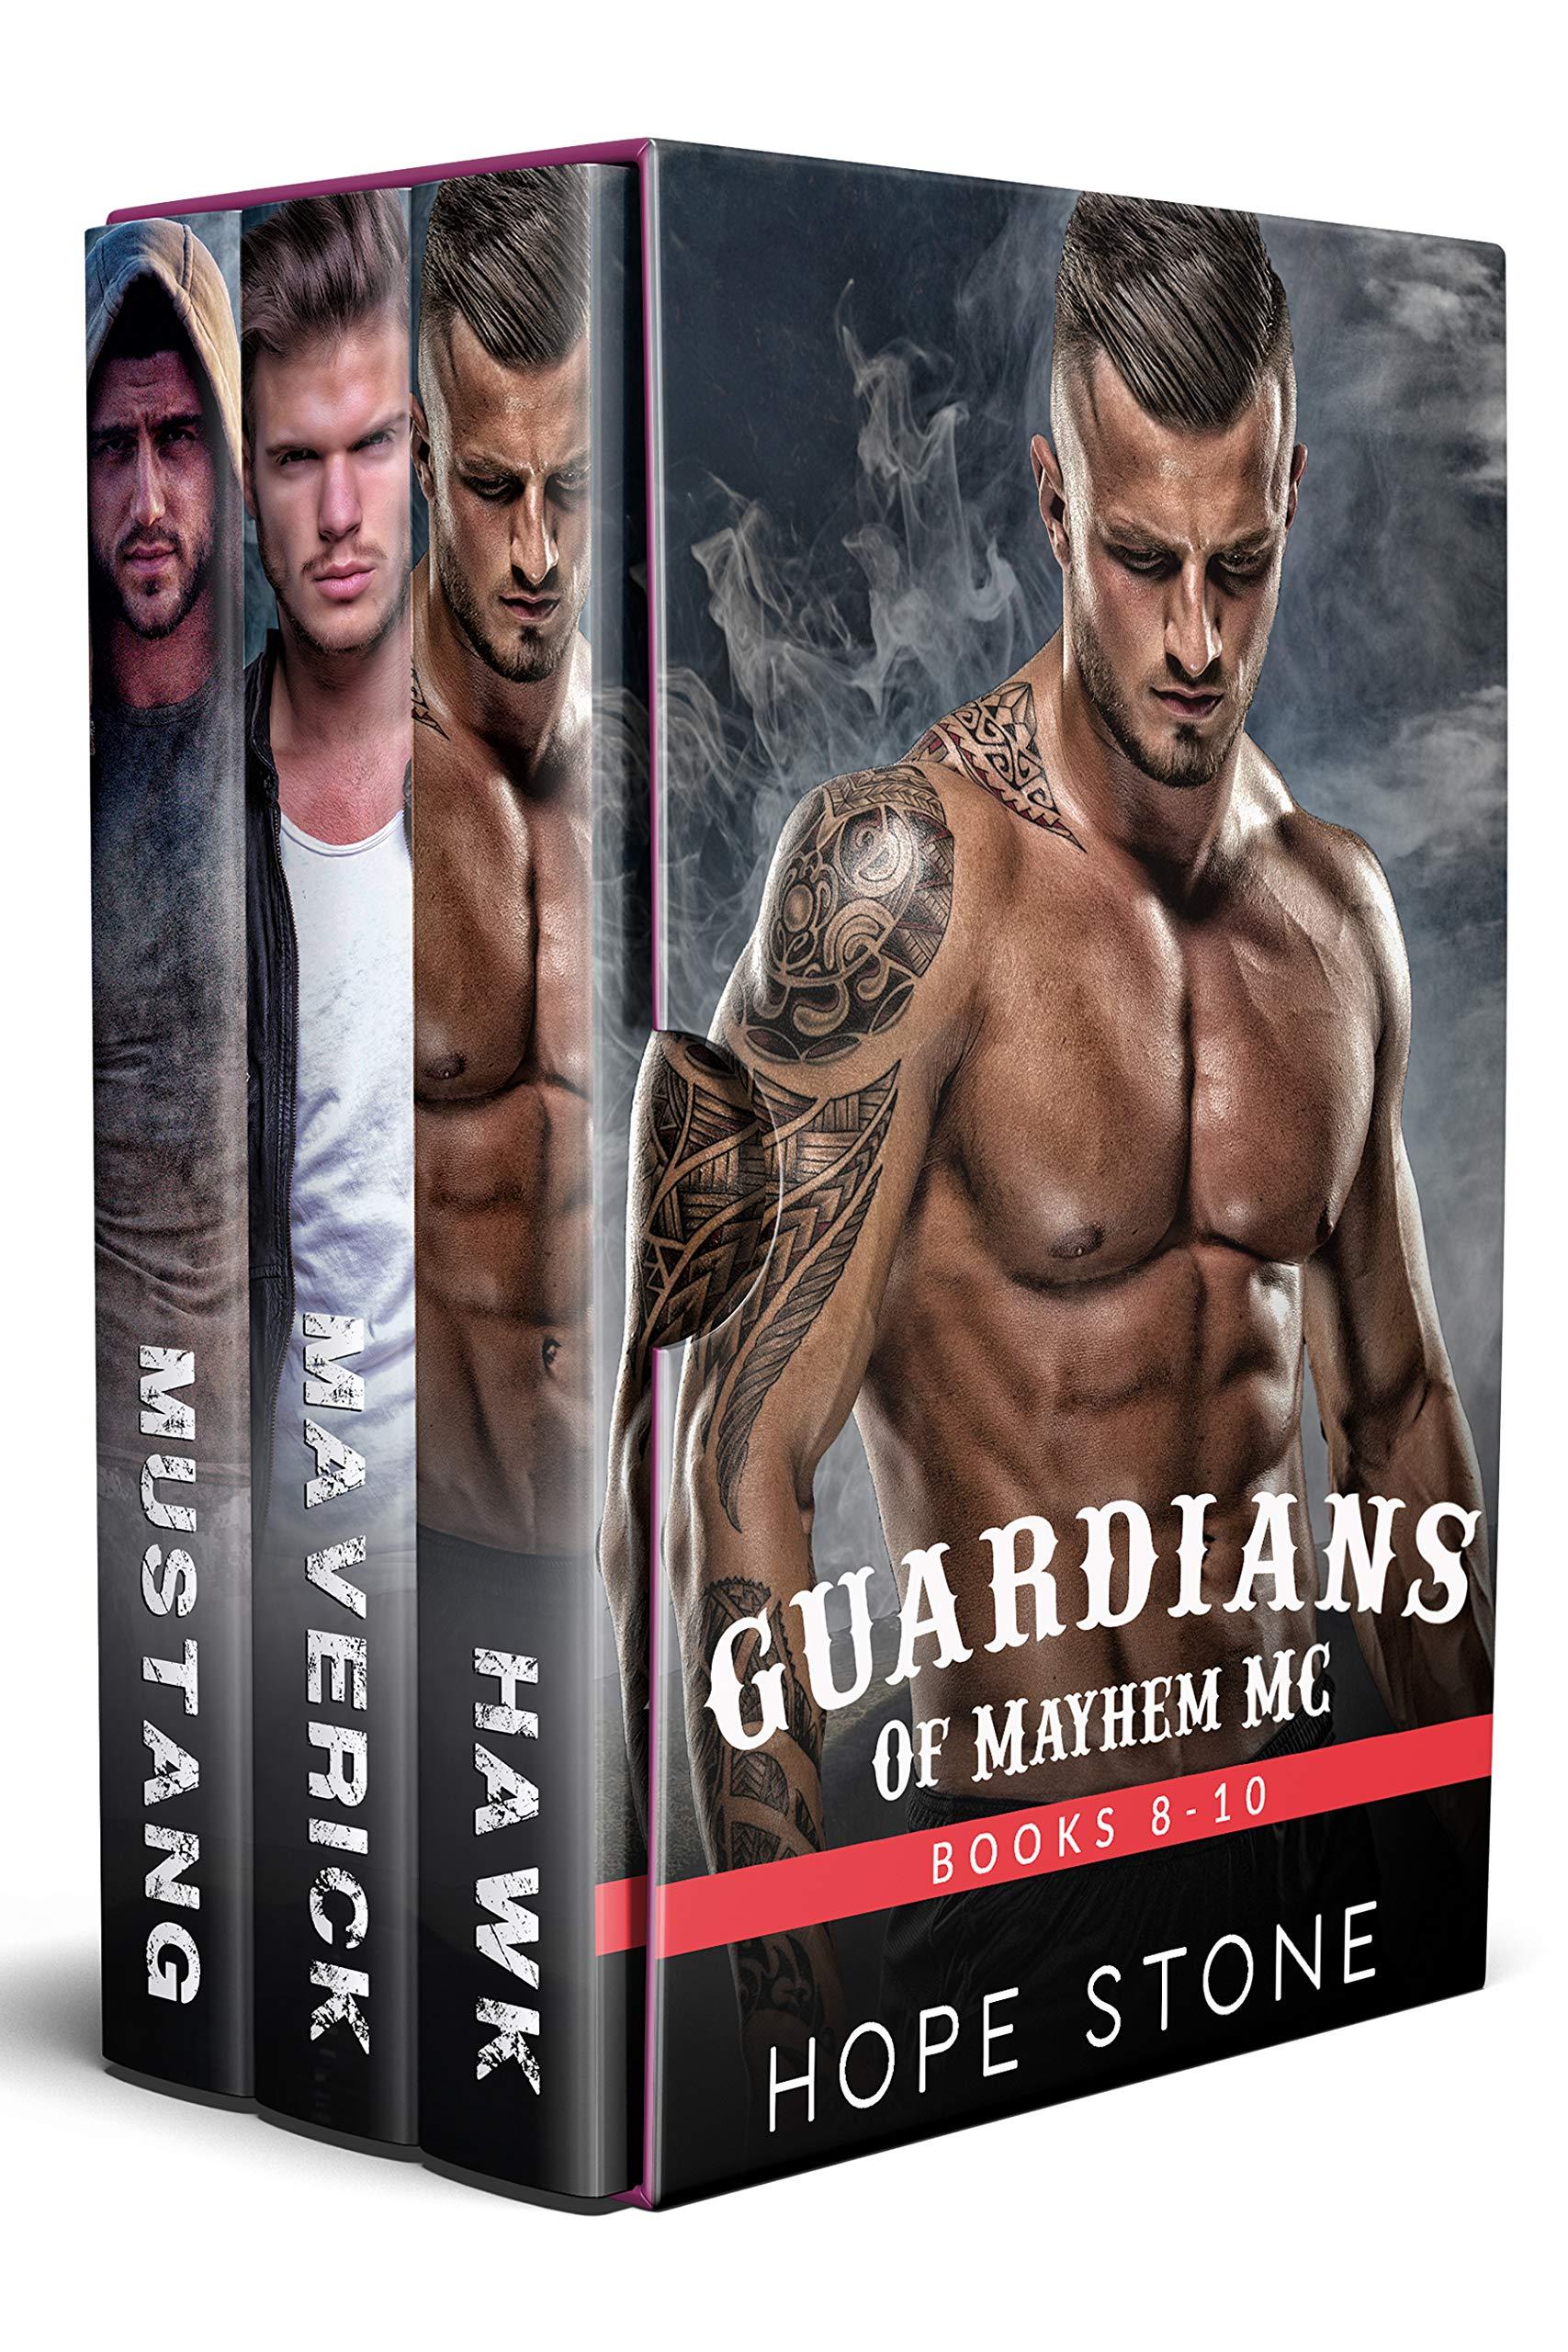 Guardians of Mayhem MC Box Set 2 (Books 8-10)